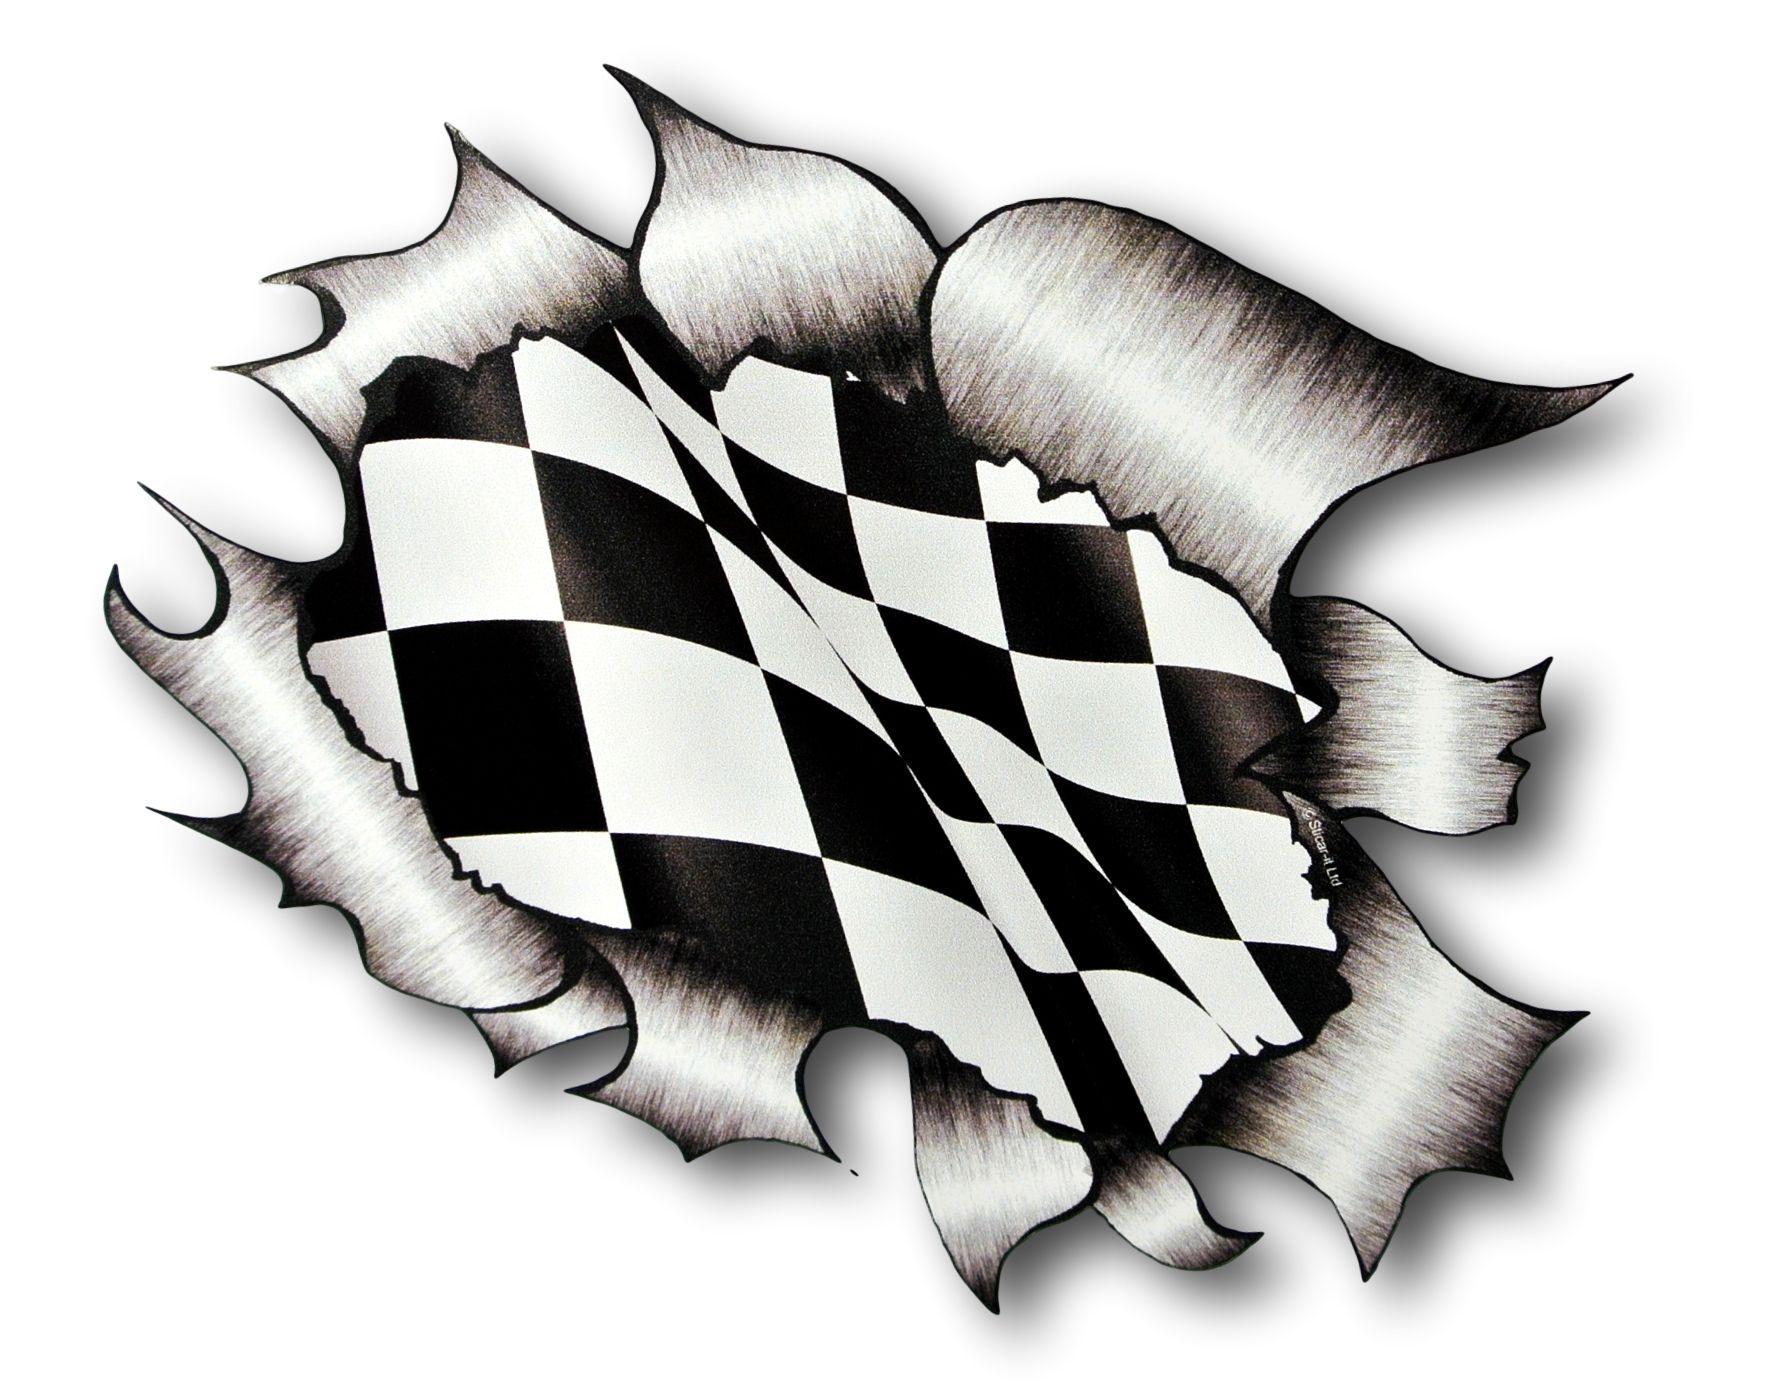 Design car flags - A4 Size Ripped Torn Metal Design With Chequered Racing Flag Motif External Vinyl Car Sticker 300x210mm